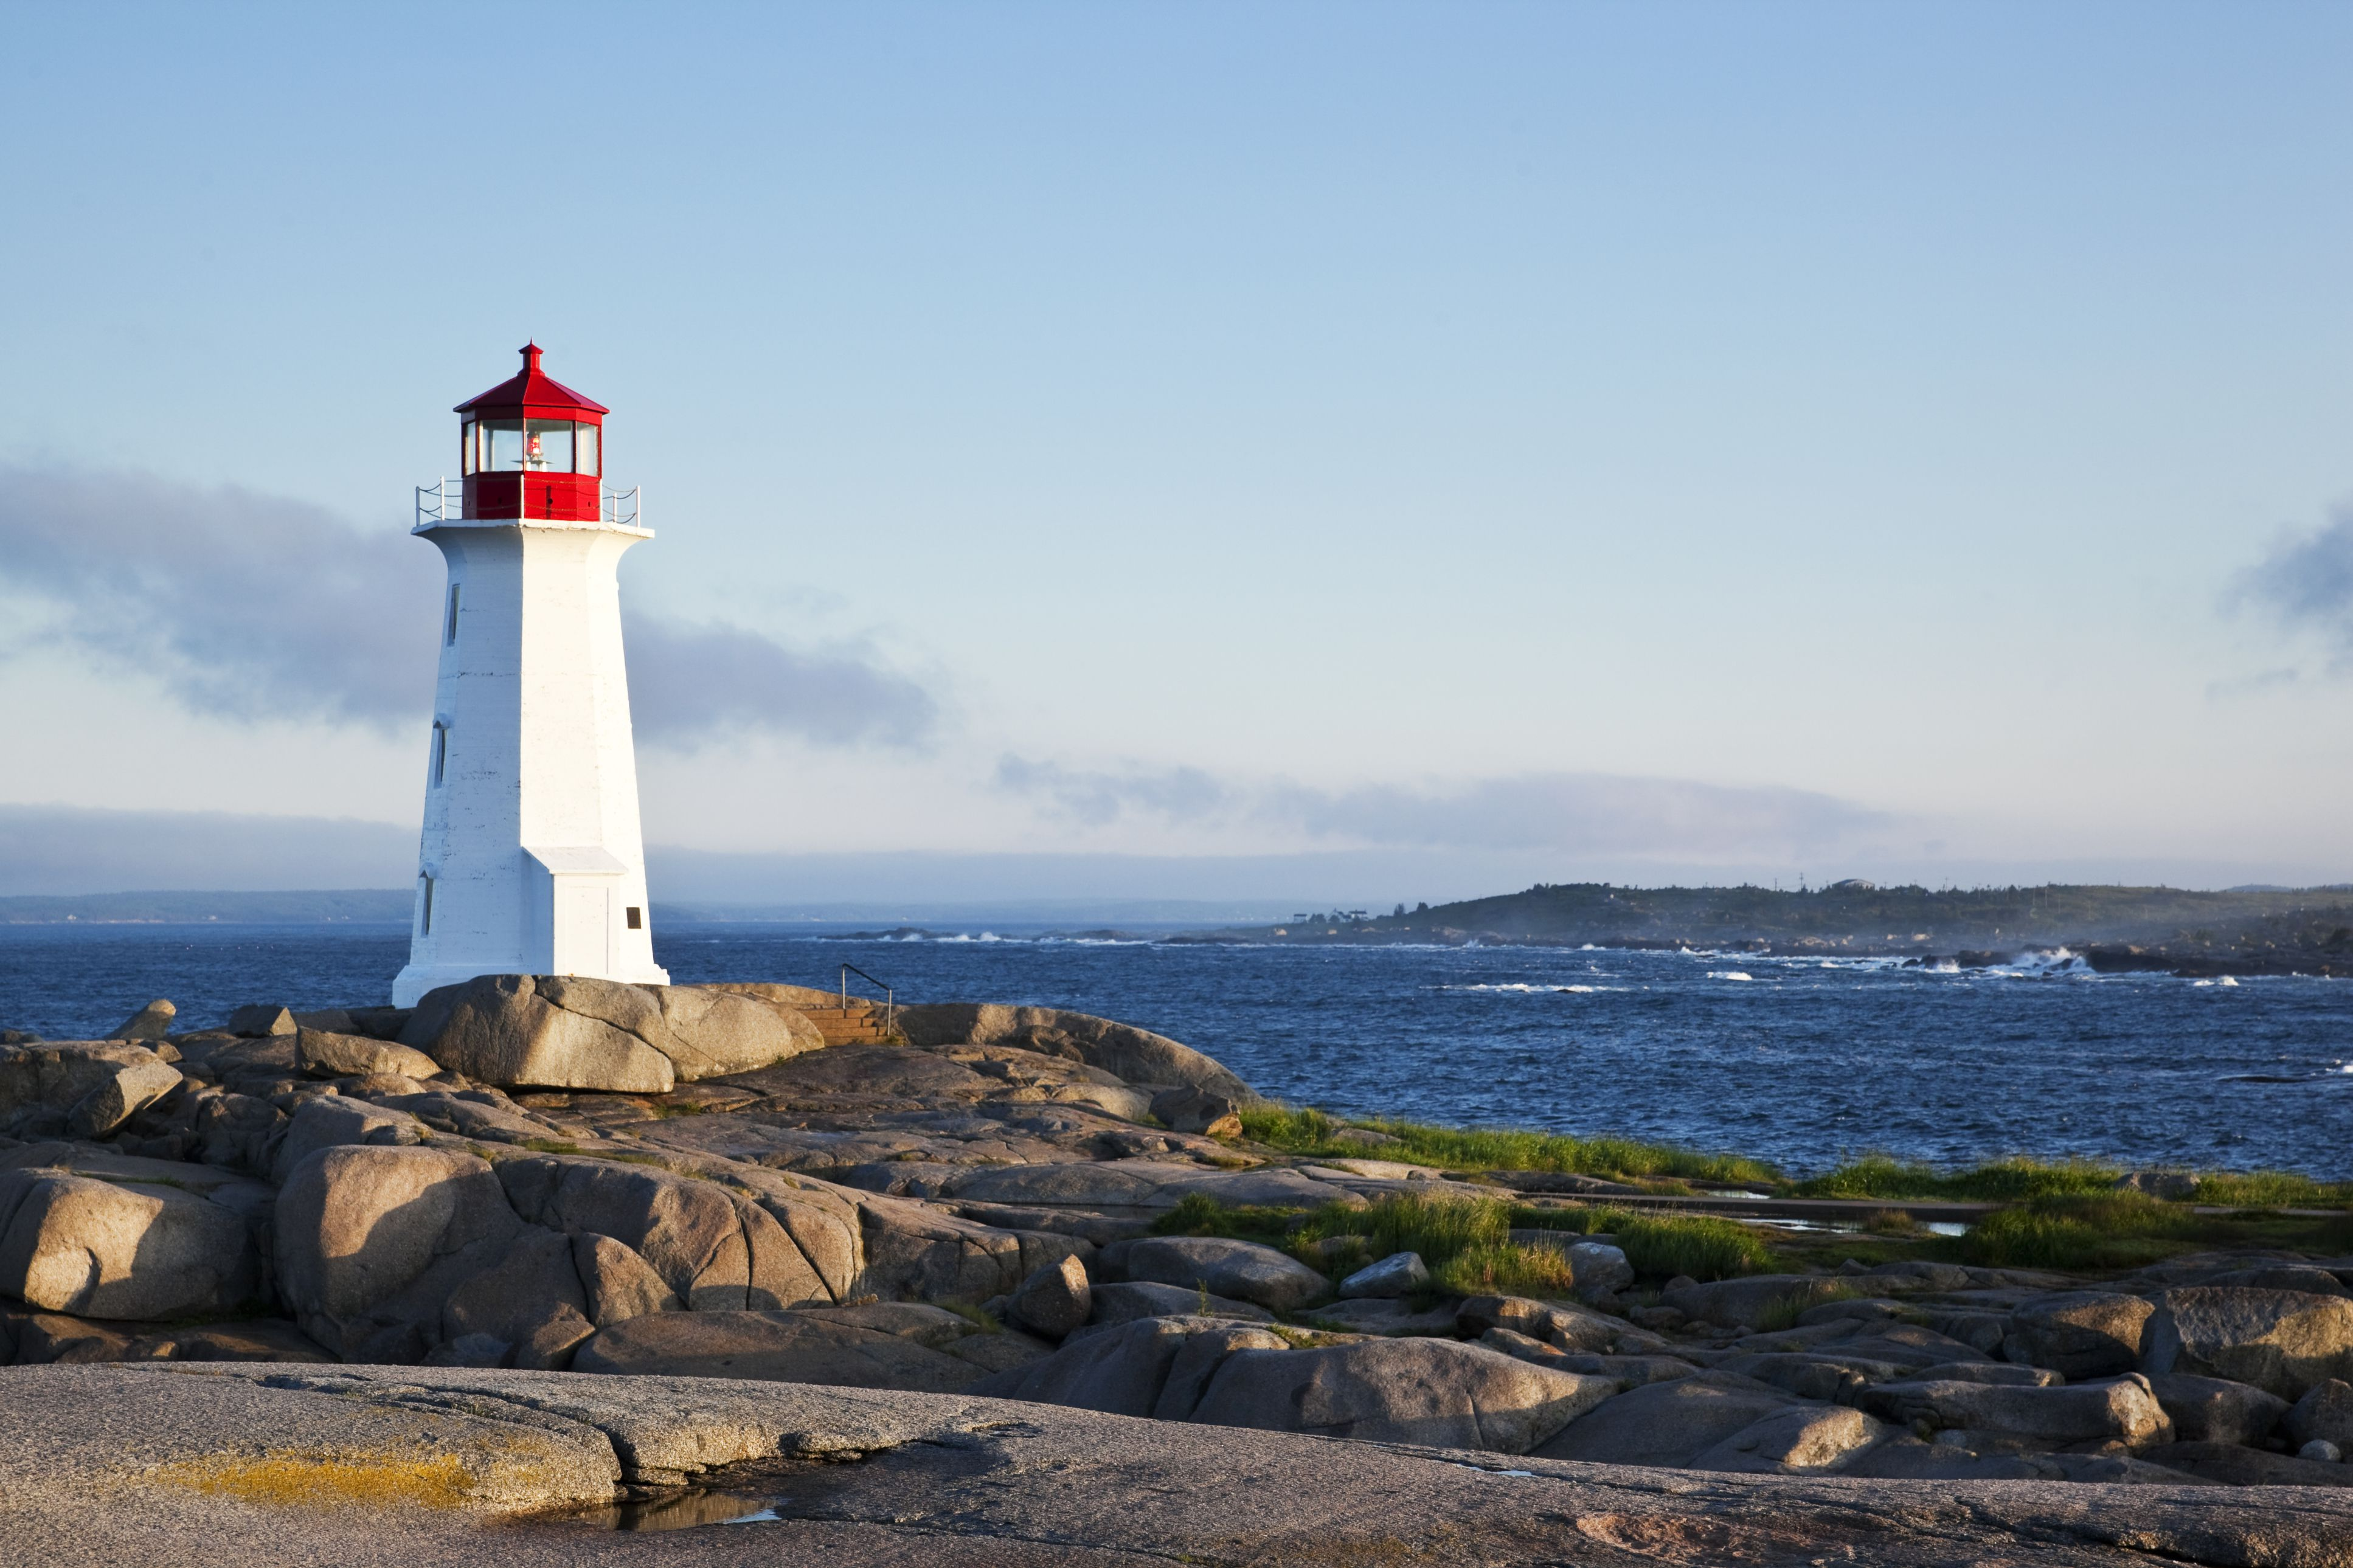 Lighthouse in Nova Scotia, Canada